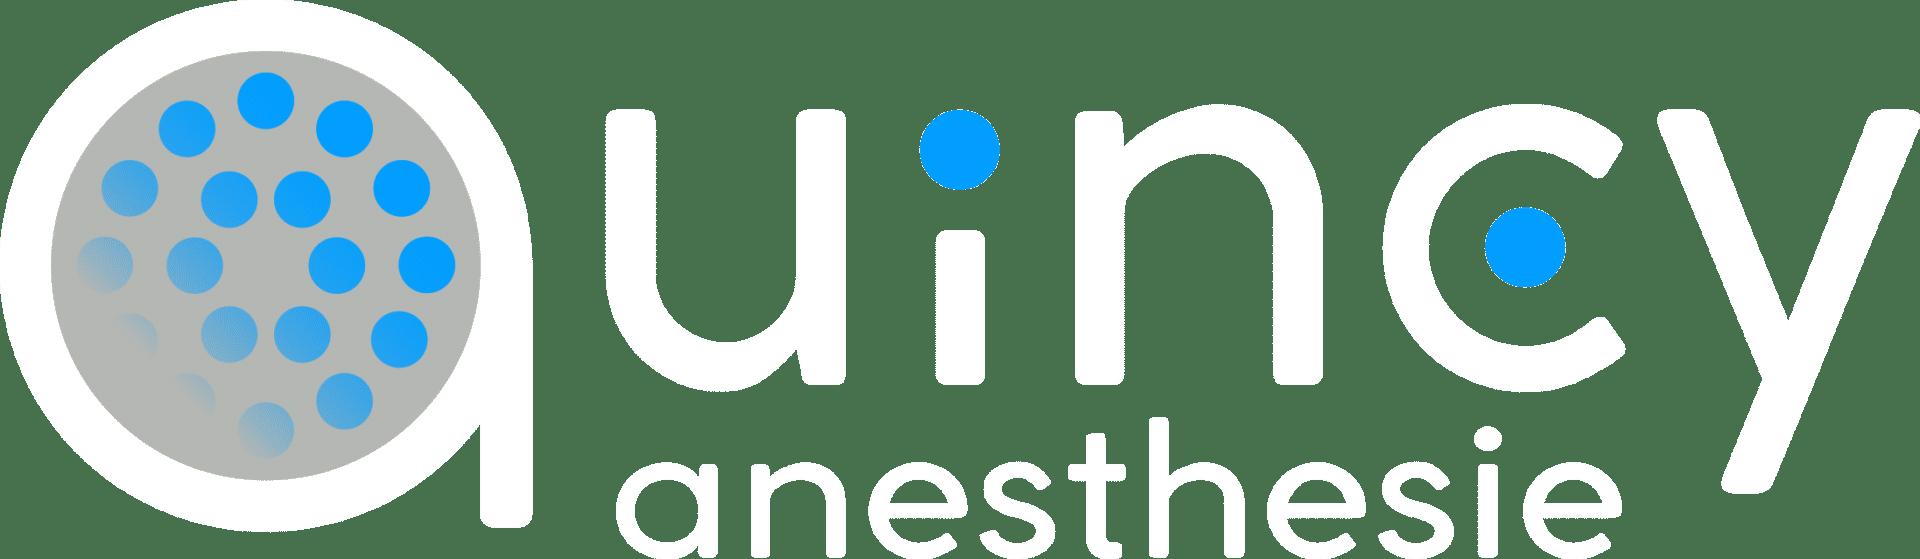 Quincy Anesthésie